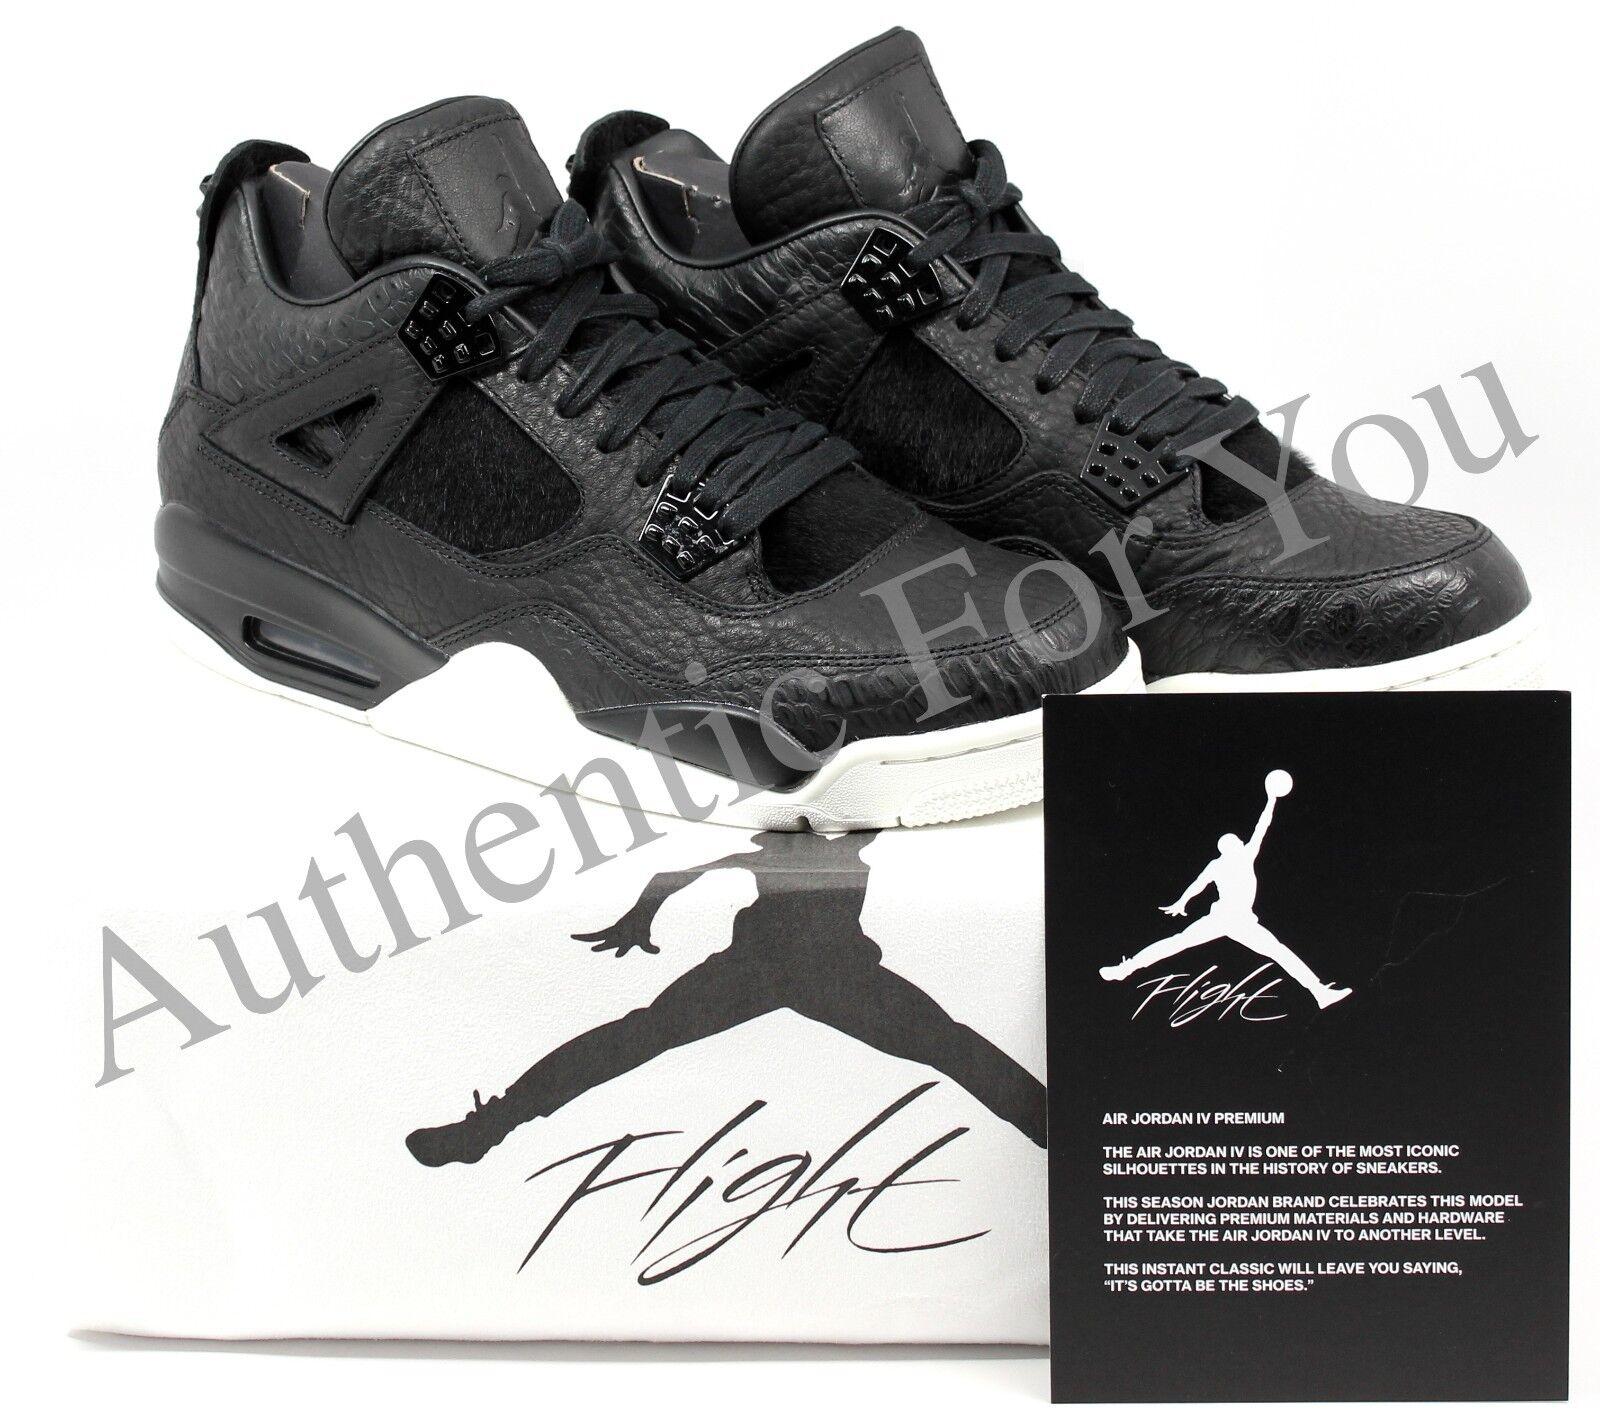 NEW Nike Air Jordan Retro 4 Pinnacle Premium Pony Hair Black 819139-010 Size 10